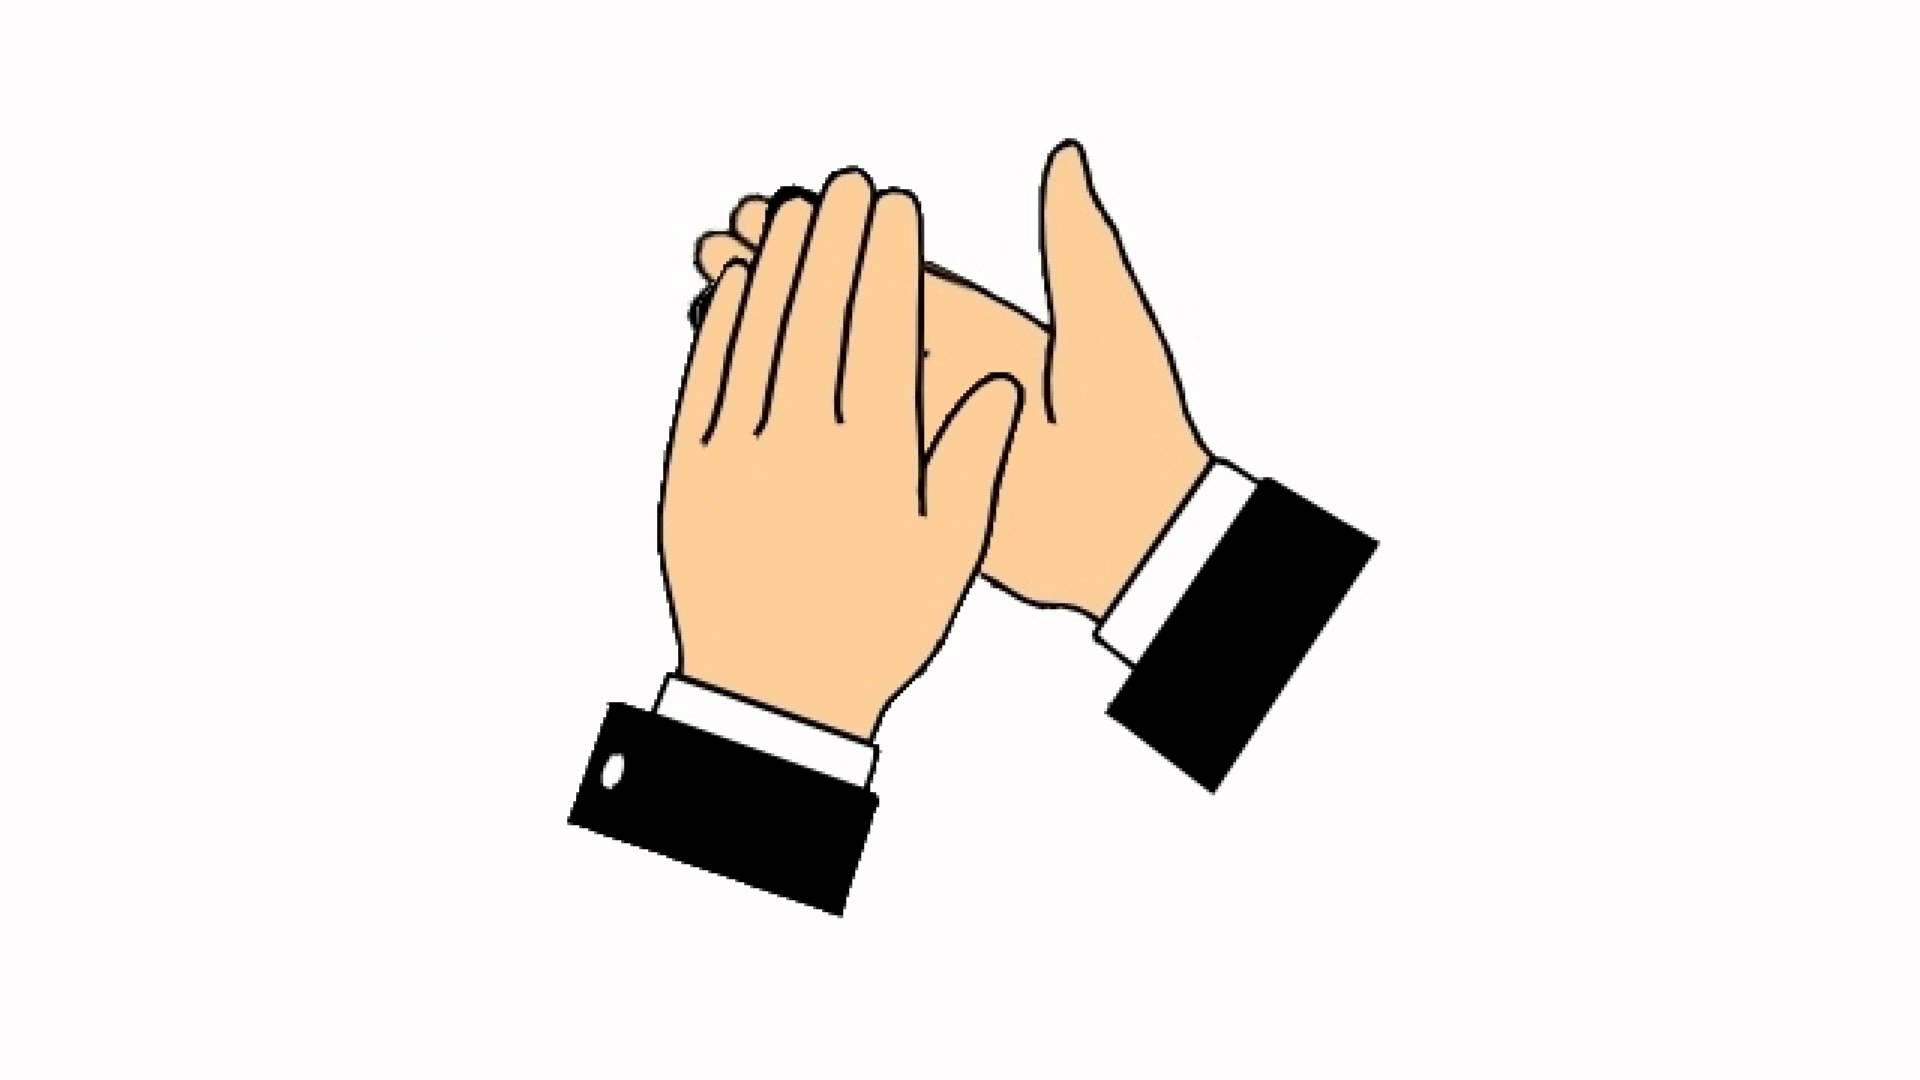 Clap Animation Clipart u0026middot; «-Clap Animation Clipart u0026middot; «-14